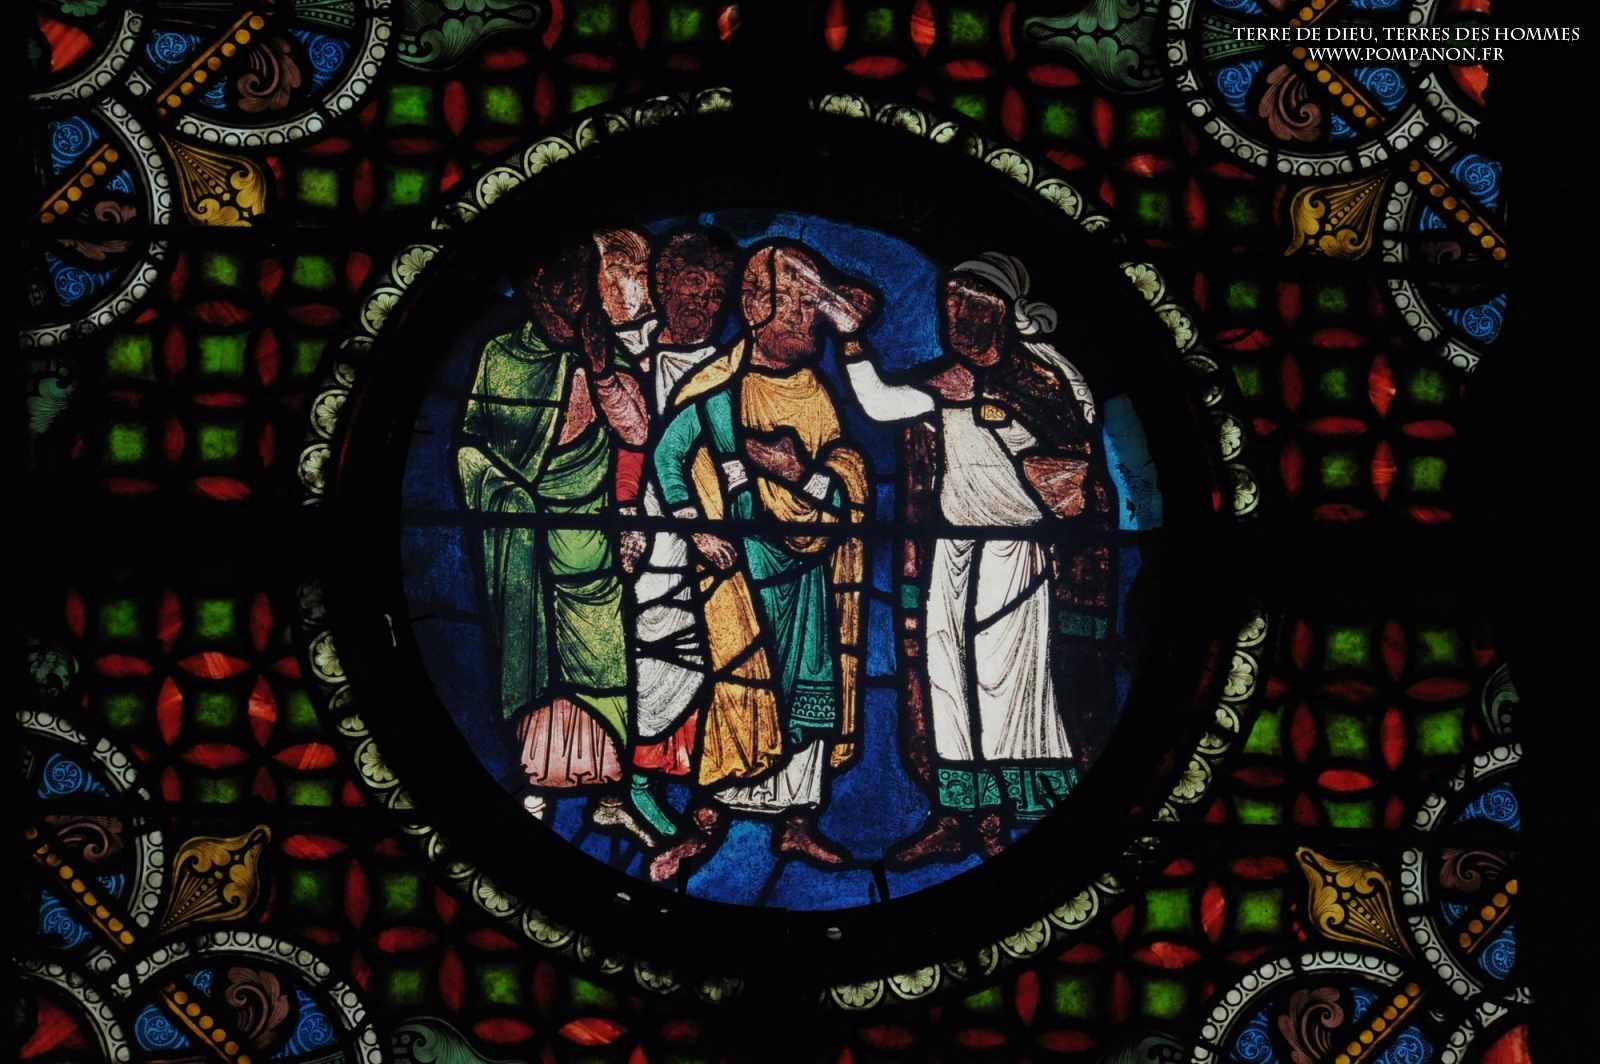 Les vitraux  du XIIIéme siècle . 5043eefcc4133